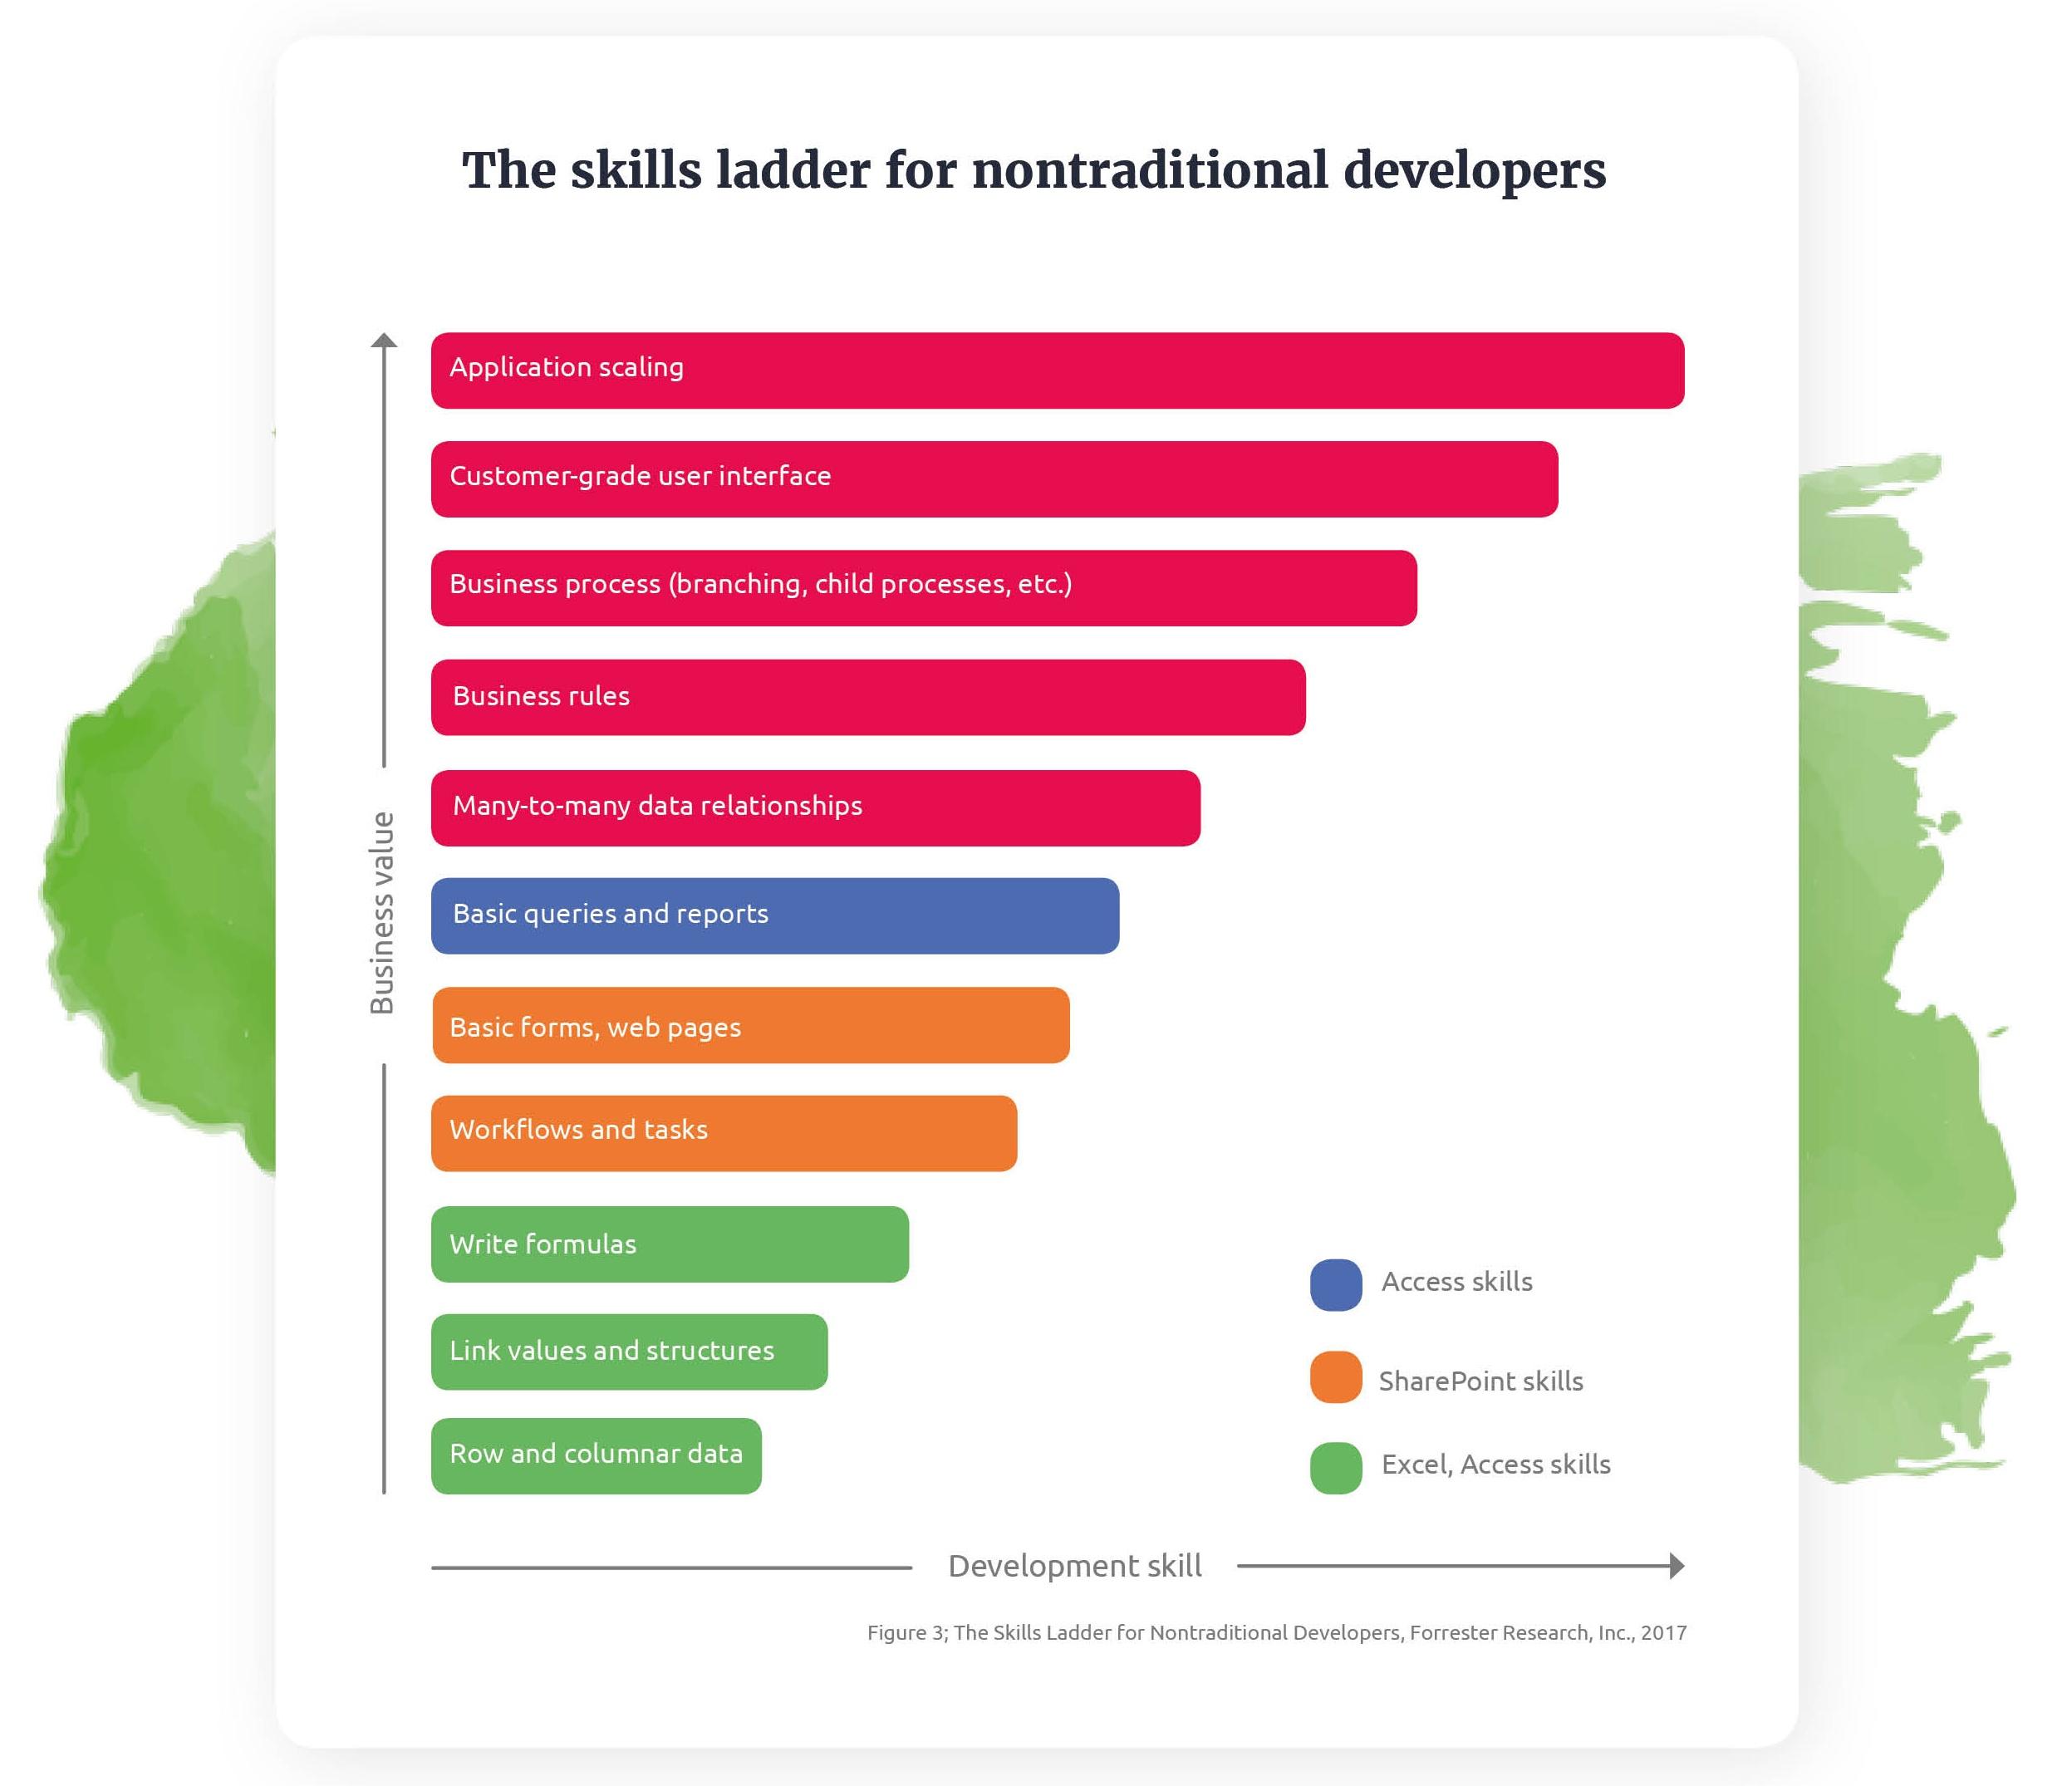 A4-Whitepaper-CitizenDevelopers-skill-ladder-1